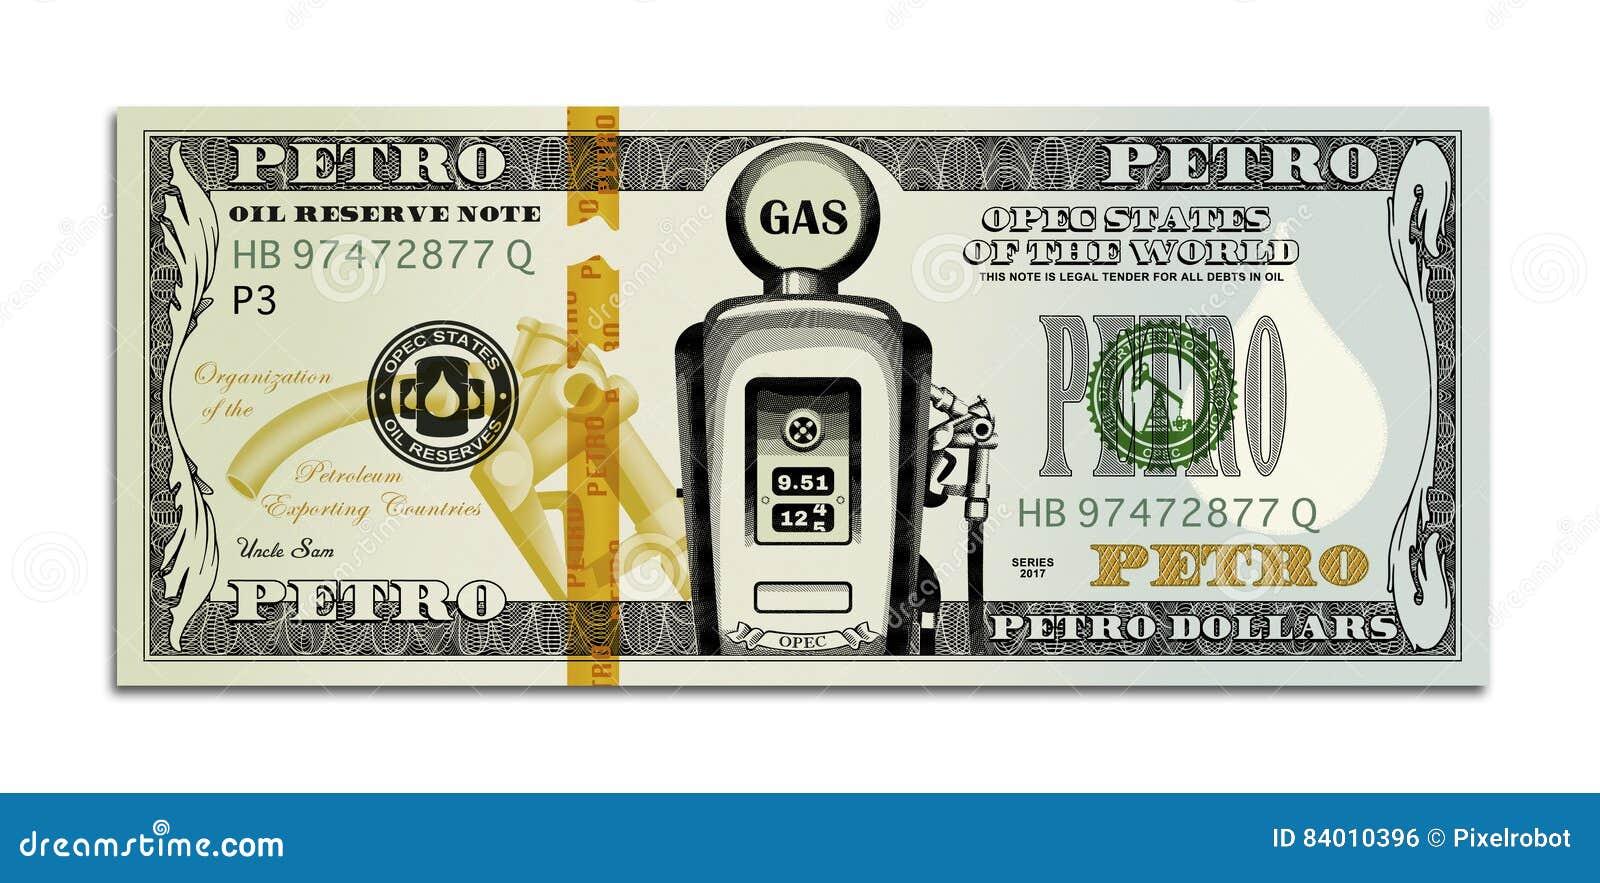 Petrodollar crypto currency stocks horse racing how to win betting baseball